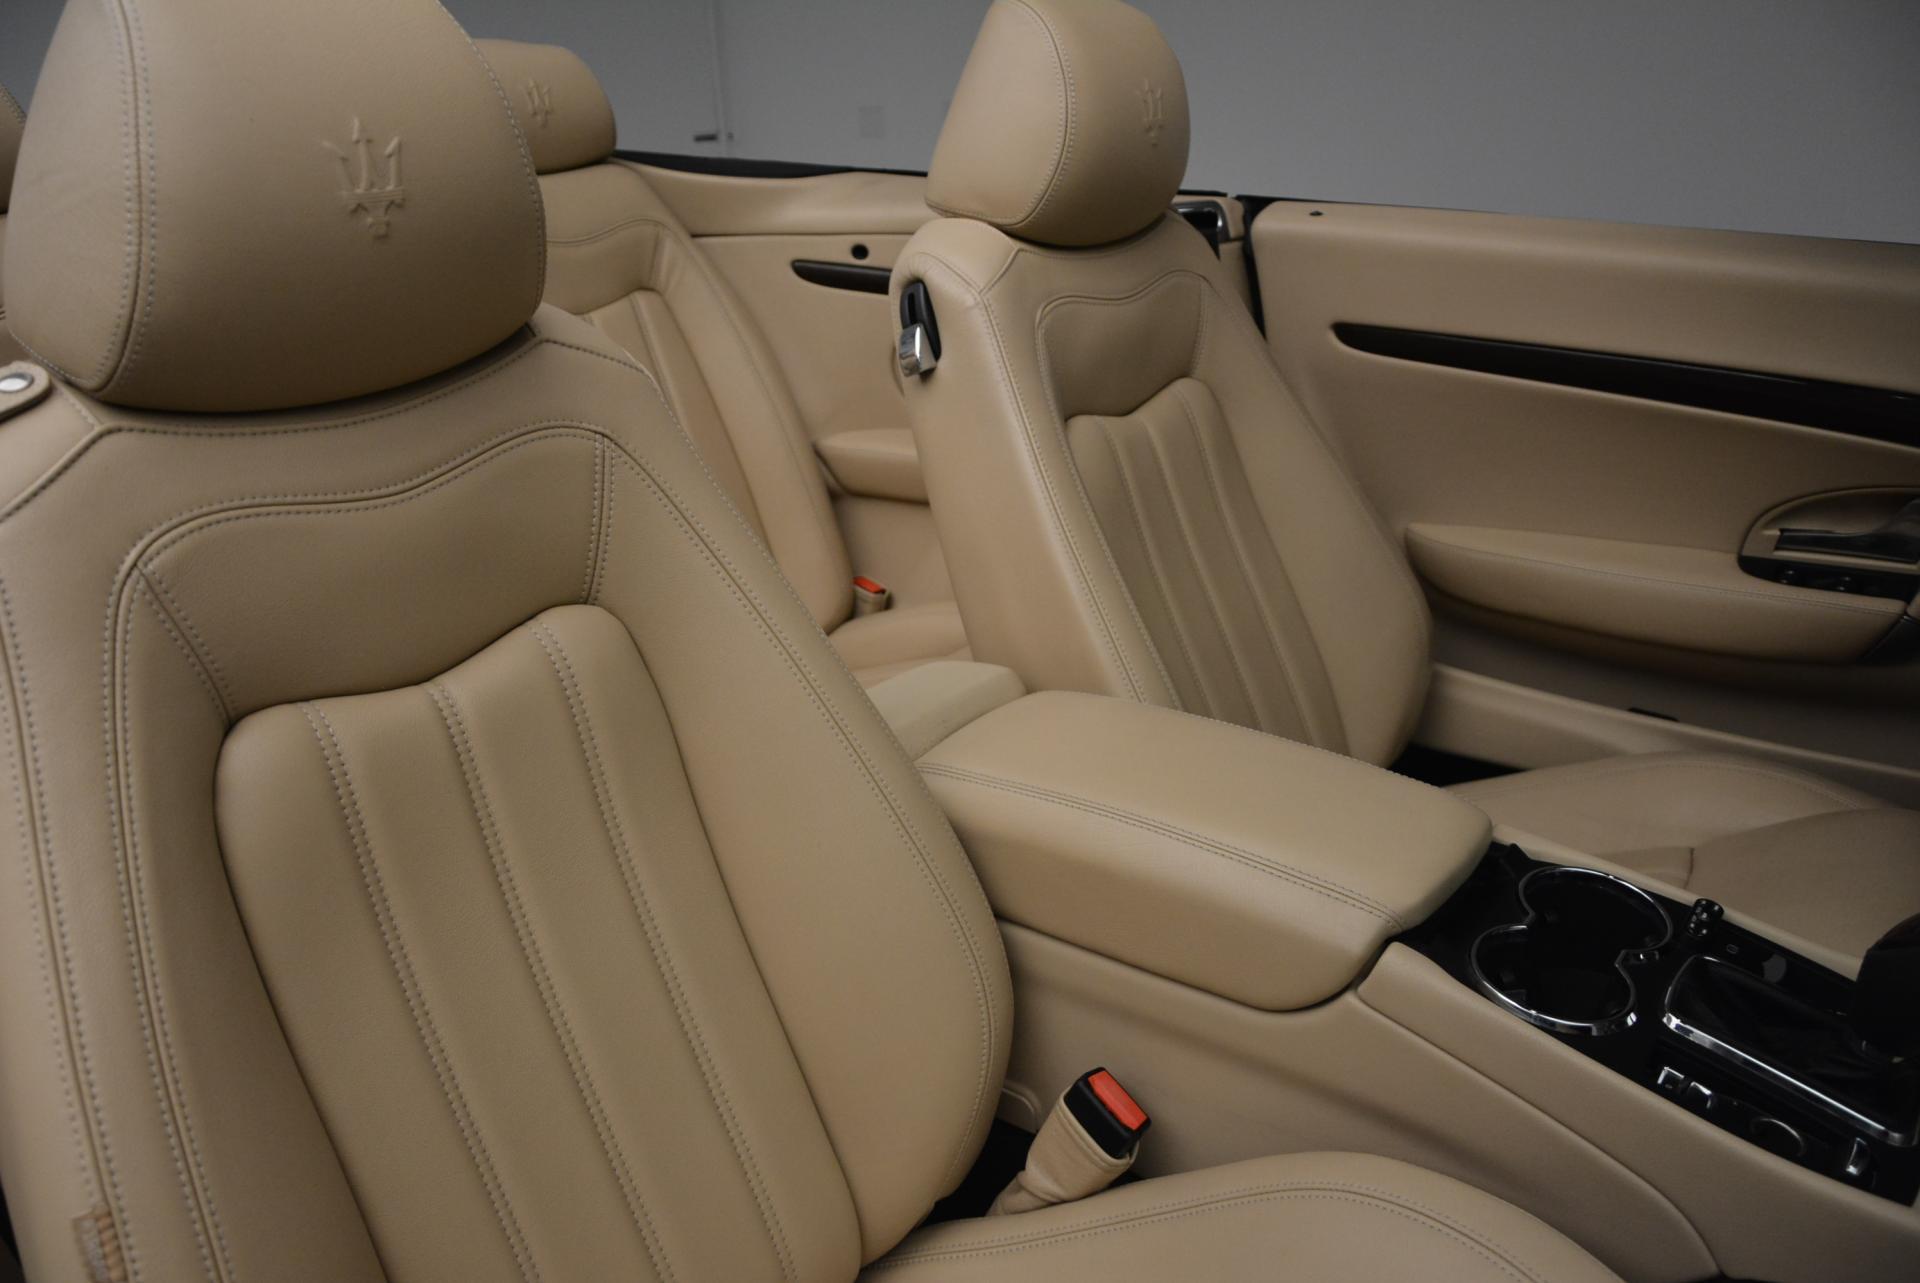 Used 2011 Maserati GranTurismo Base For Sale In Westport, CT 158_p33